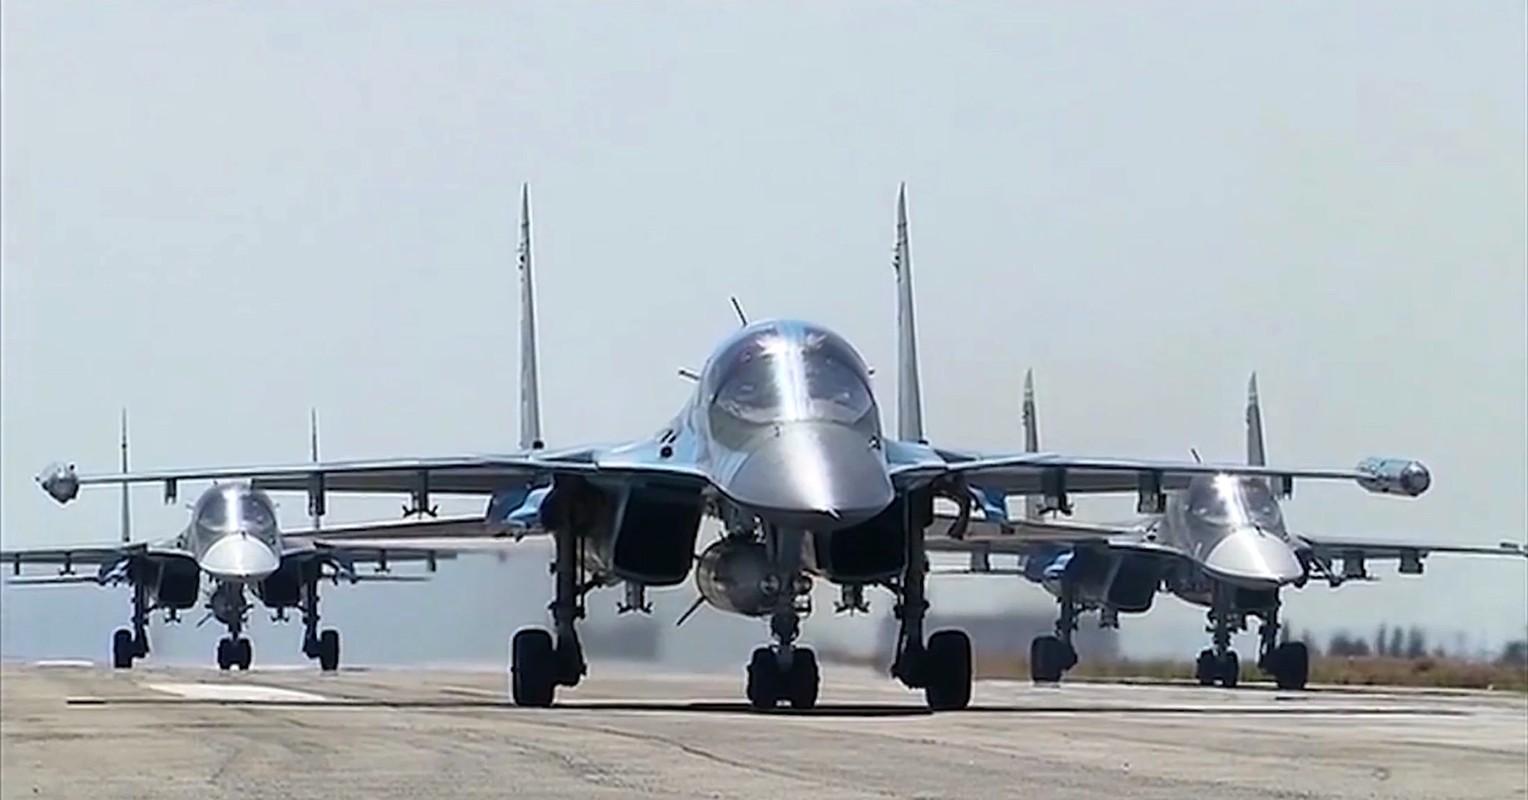 Tai sao Nga khong dung may bay nem bom chien luoc Tu-95 o Syria?-Hinh-5